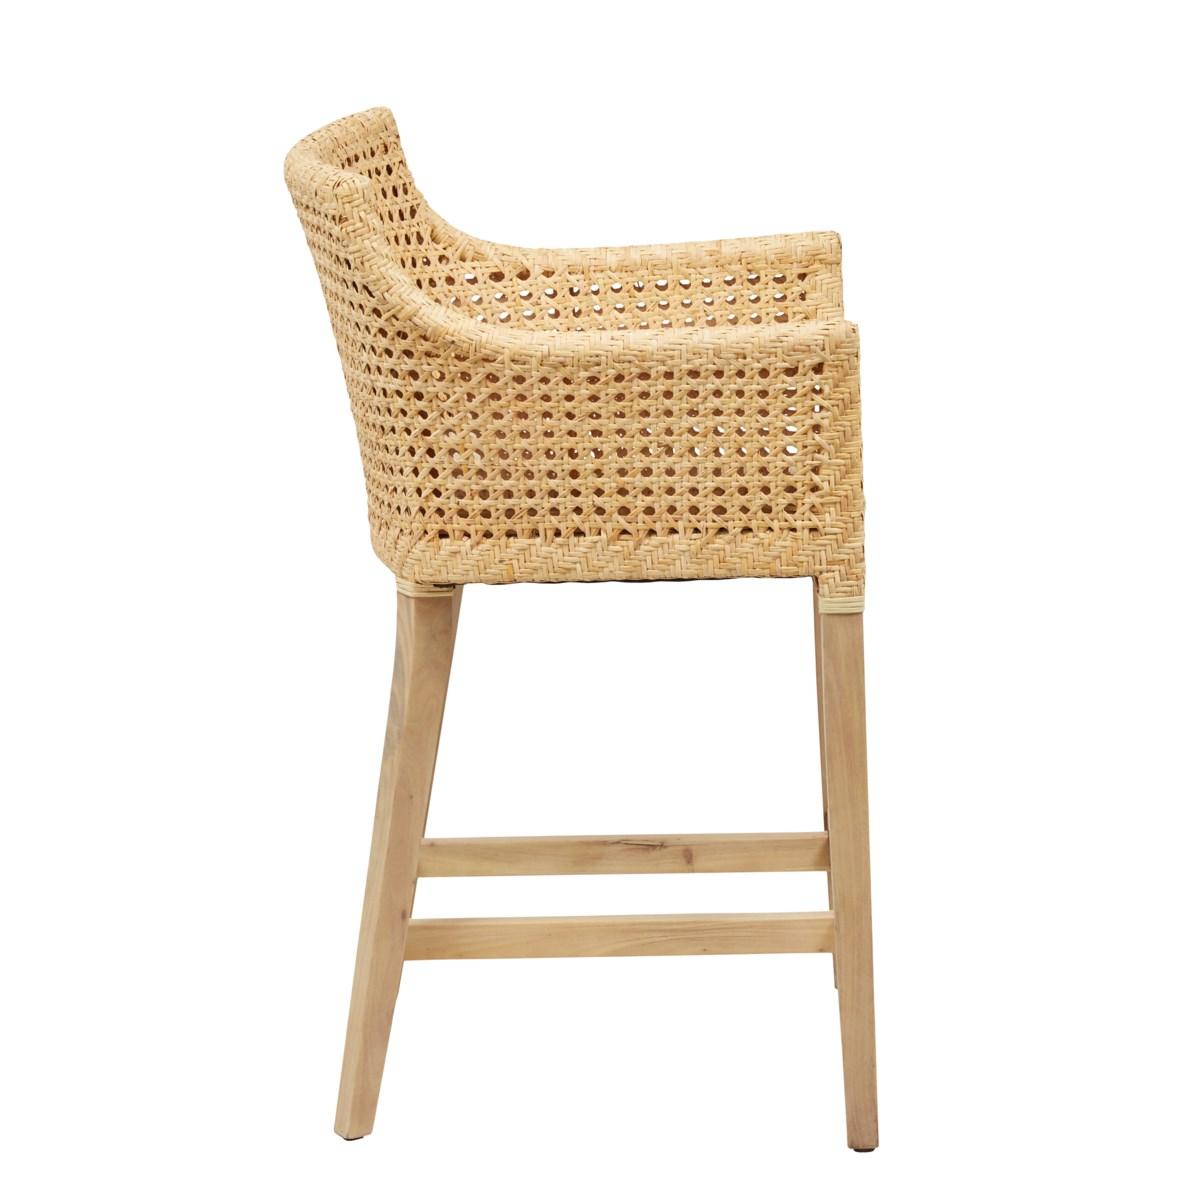 Blora Counter Chair Mahogany Frame Color - Natural Woven Rattan Color - Natural  Cushion Color -